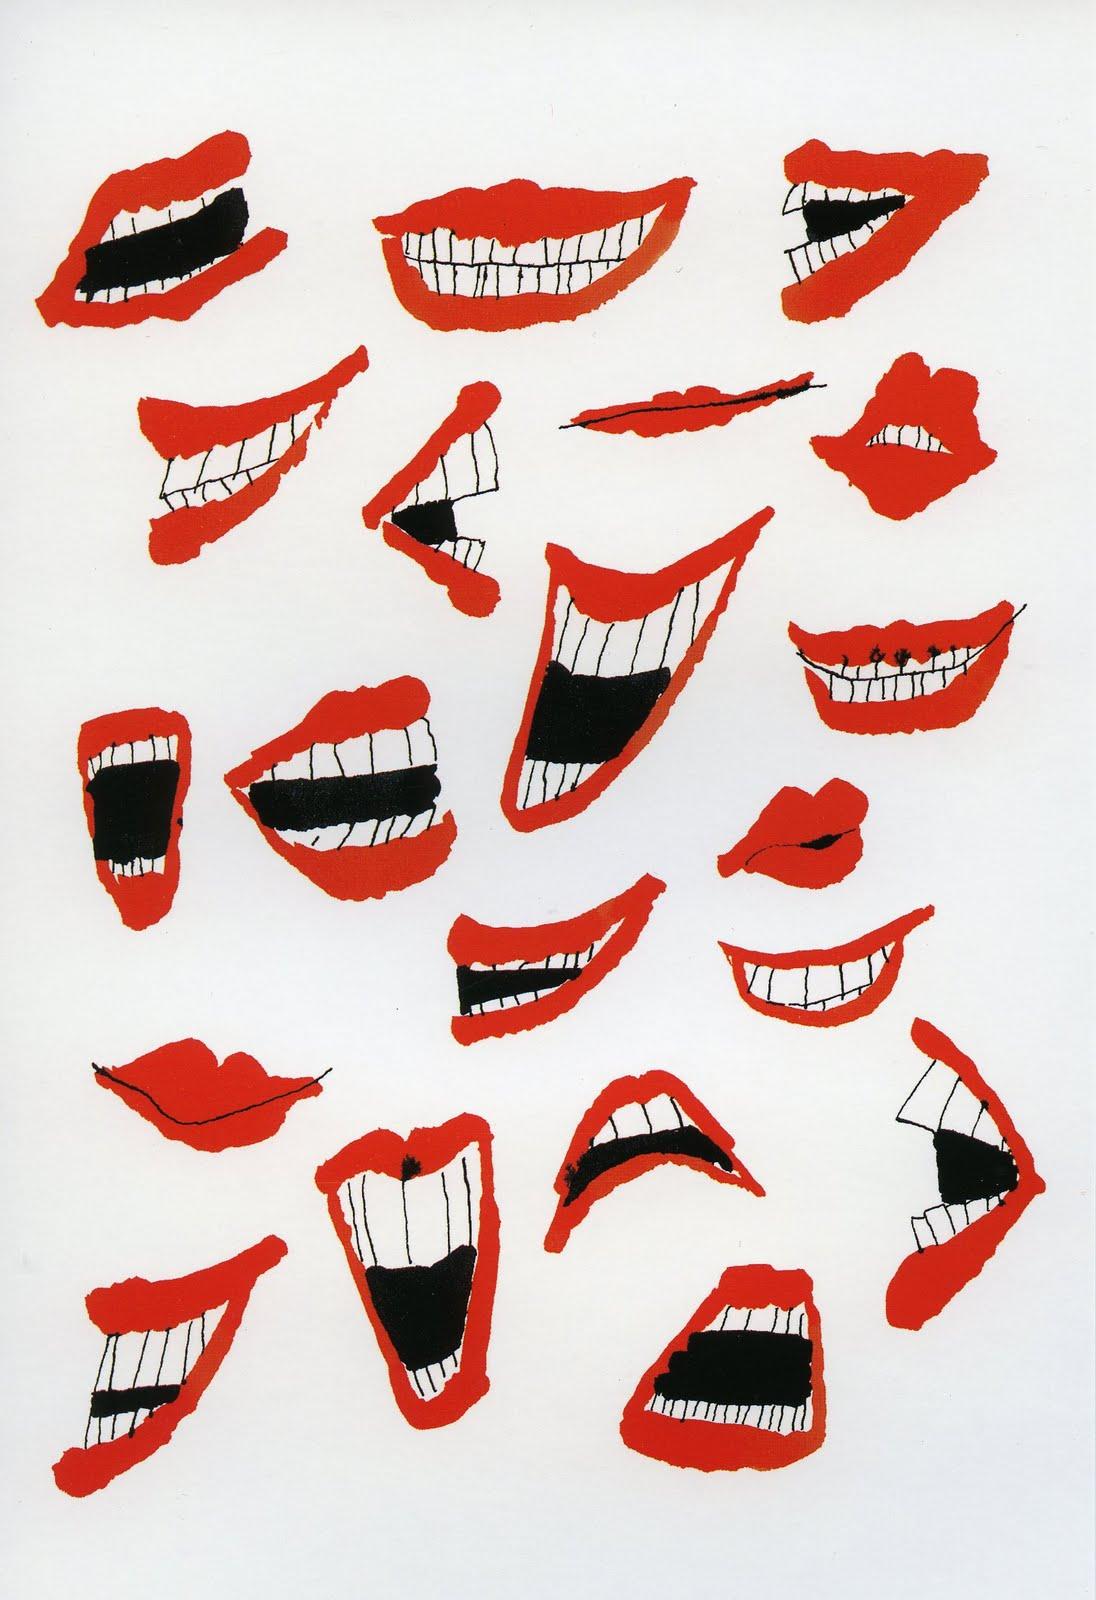 patrick � 20th century graphic designers � alan fletcher